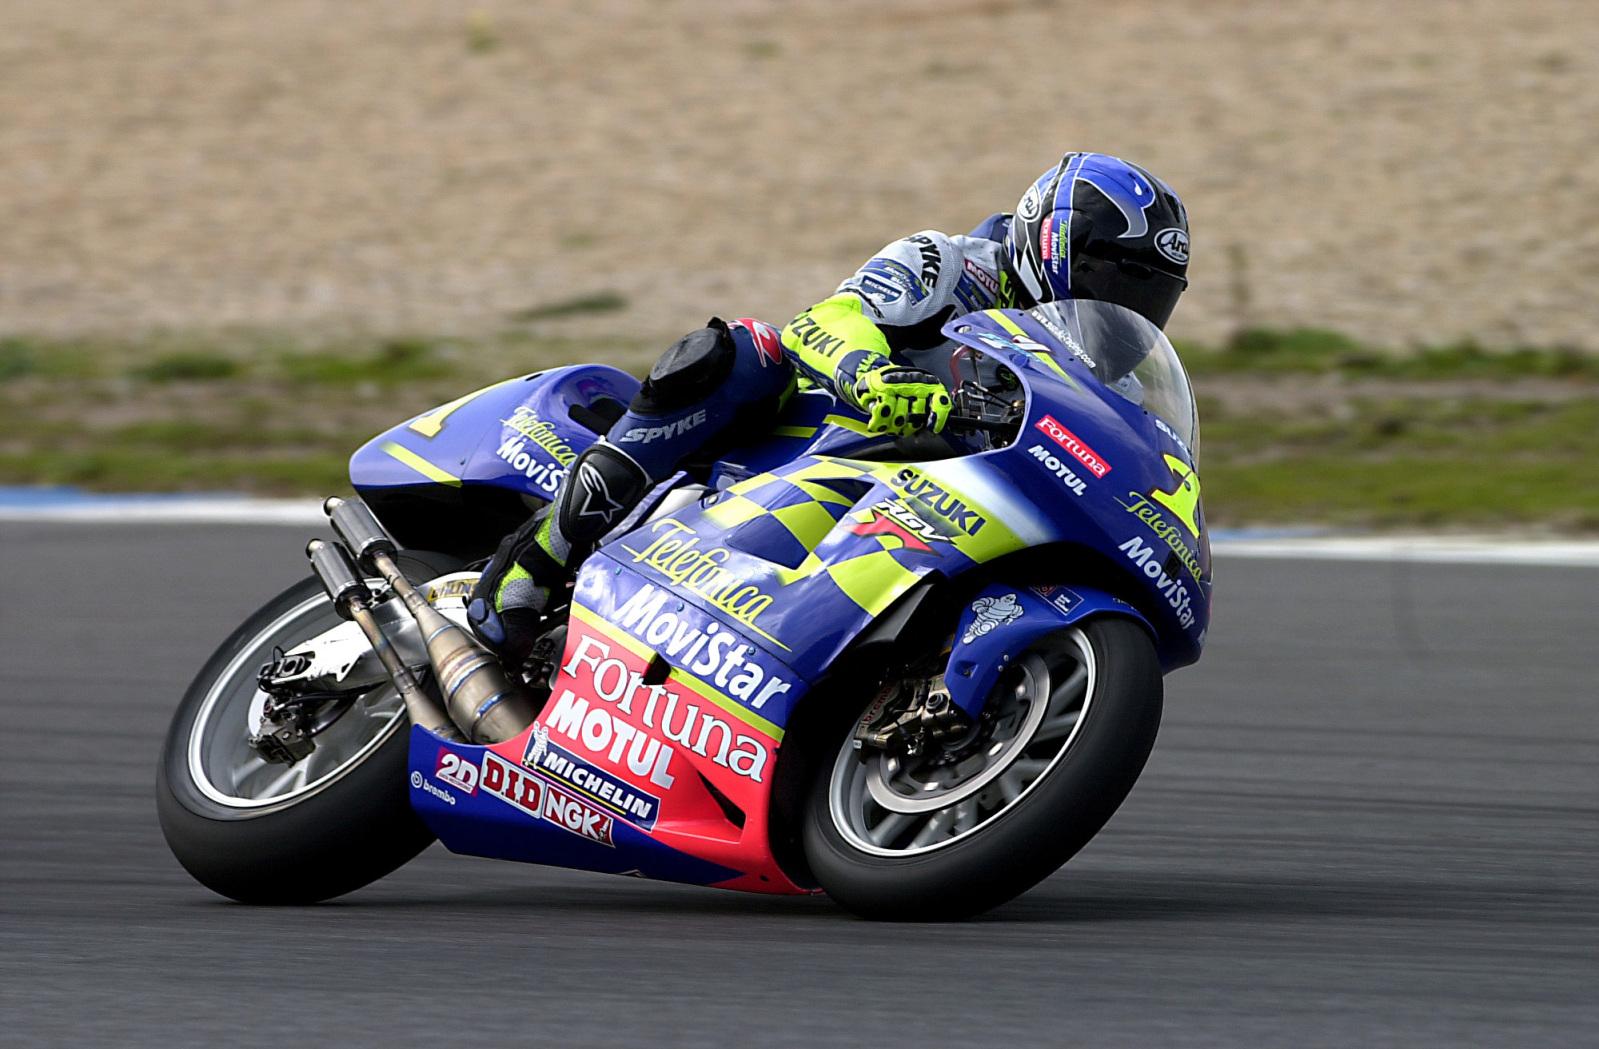 Fotos 500cc/250cc/125cc Ok0vib